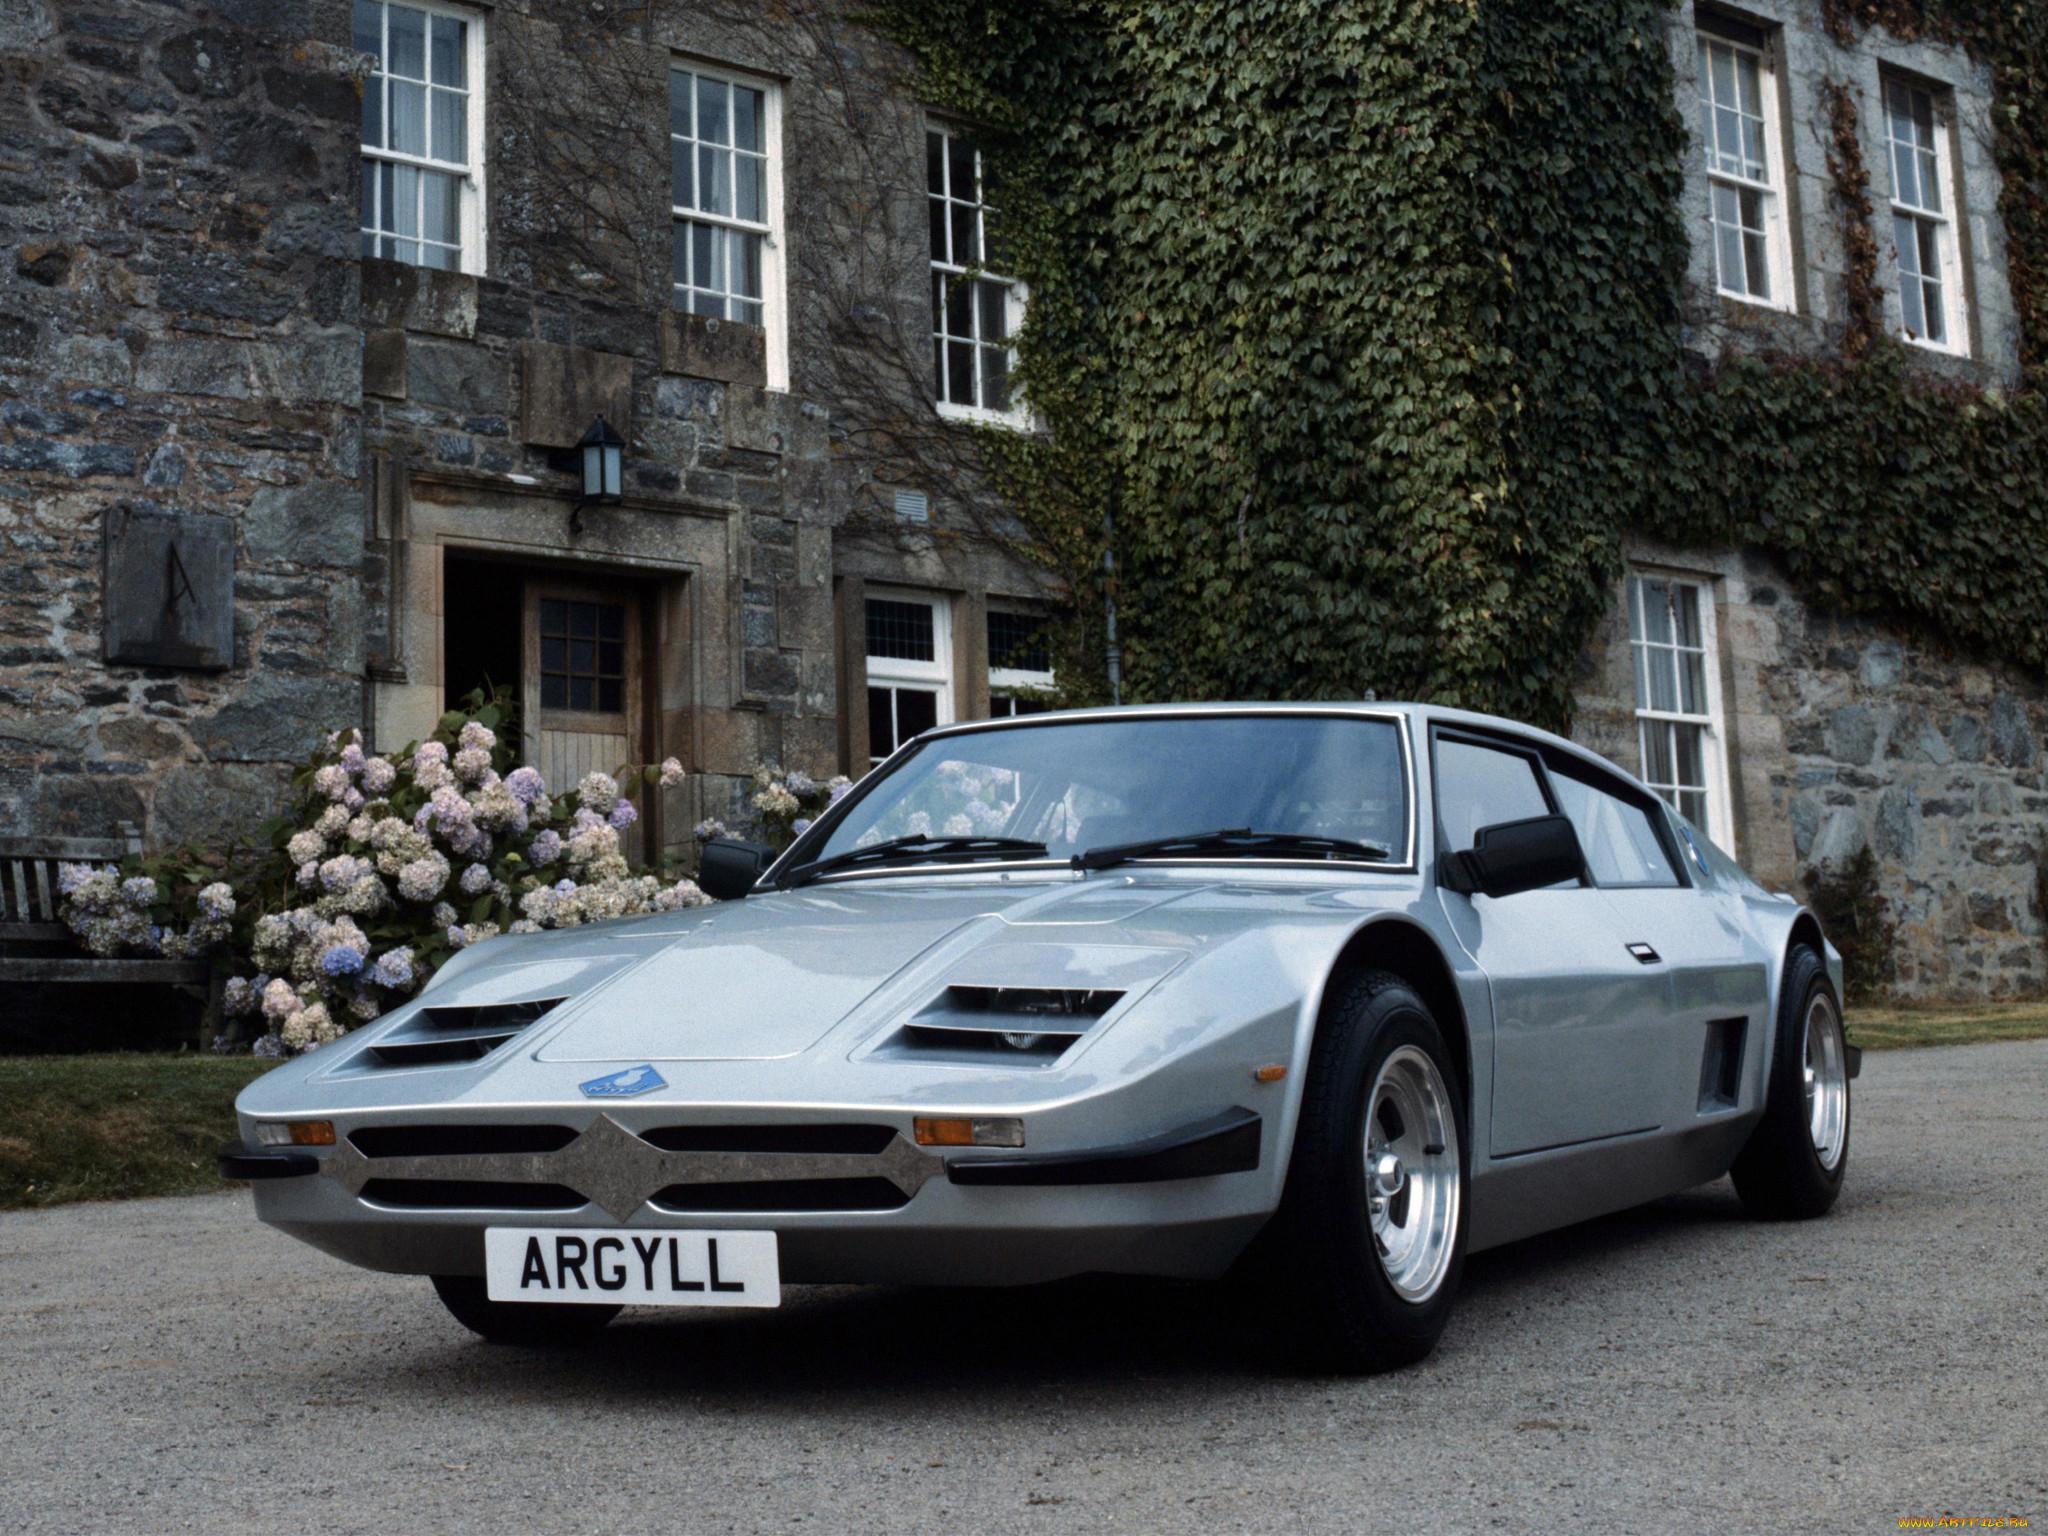 Автомобиль Argyll